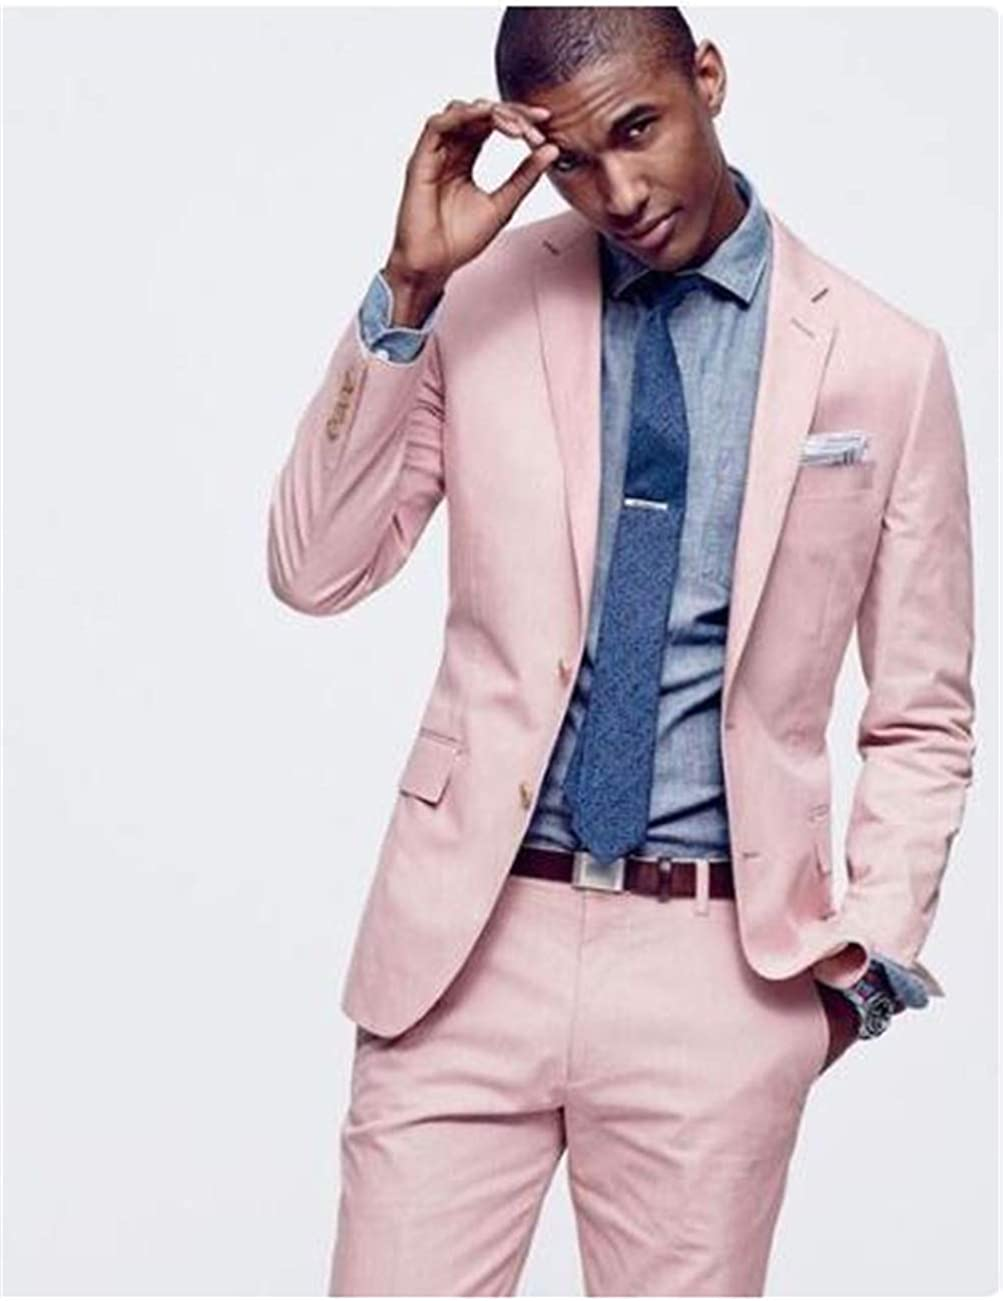 Wedding Men Suit Two Pieces Blazer Slim Fit One Button Notched Collar Causal Men's Suits Groom Tuxedo(Jacket+Pants)